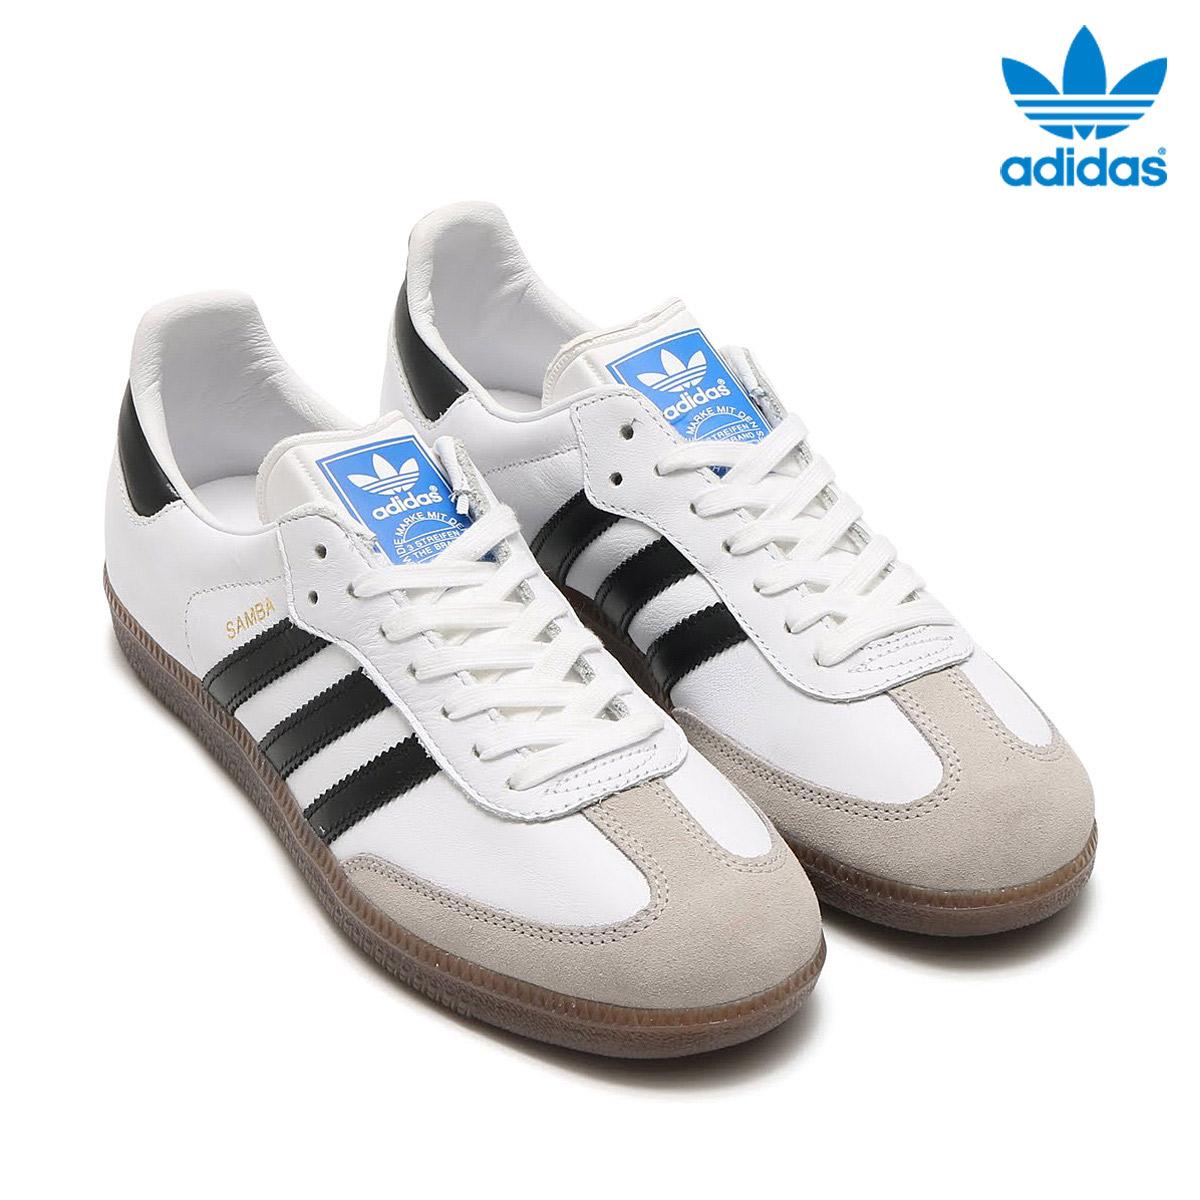 adidas Originals SAMBA OG(アディダス オリジナルス サンバ)(Running White/Core Black/Gum)【メンズ レディース スニーカー】17SS-I